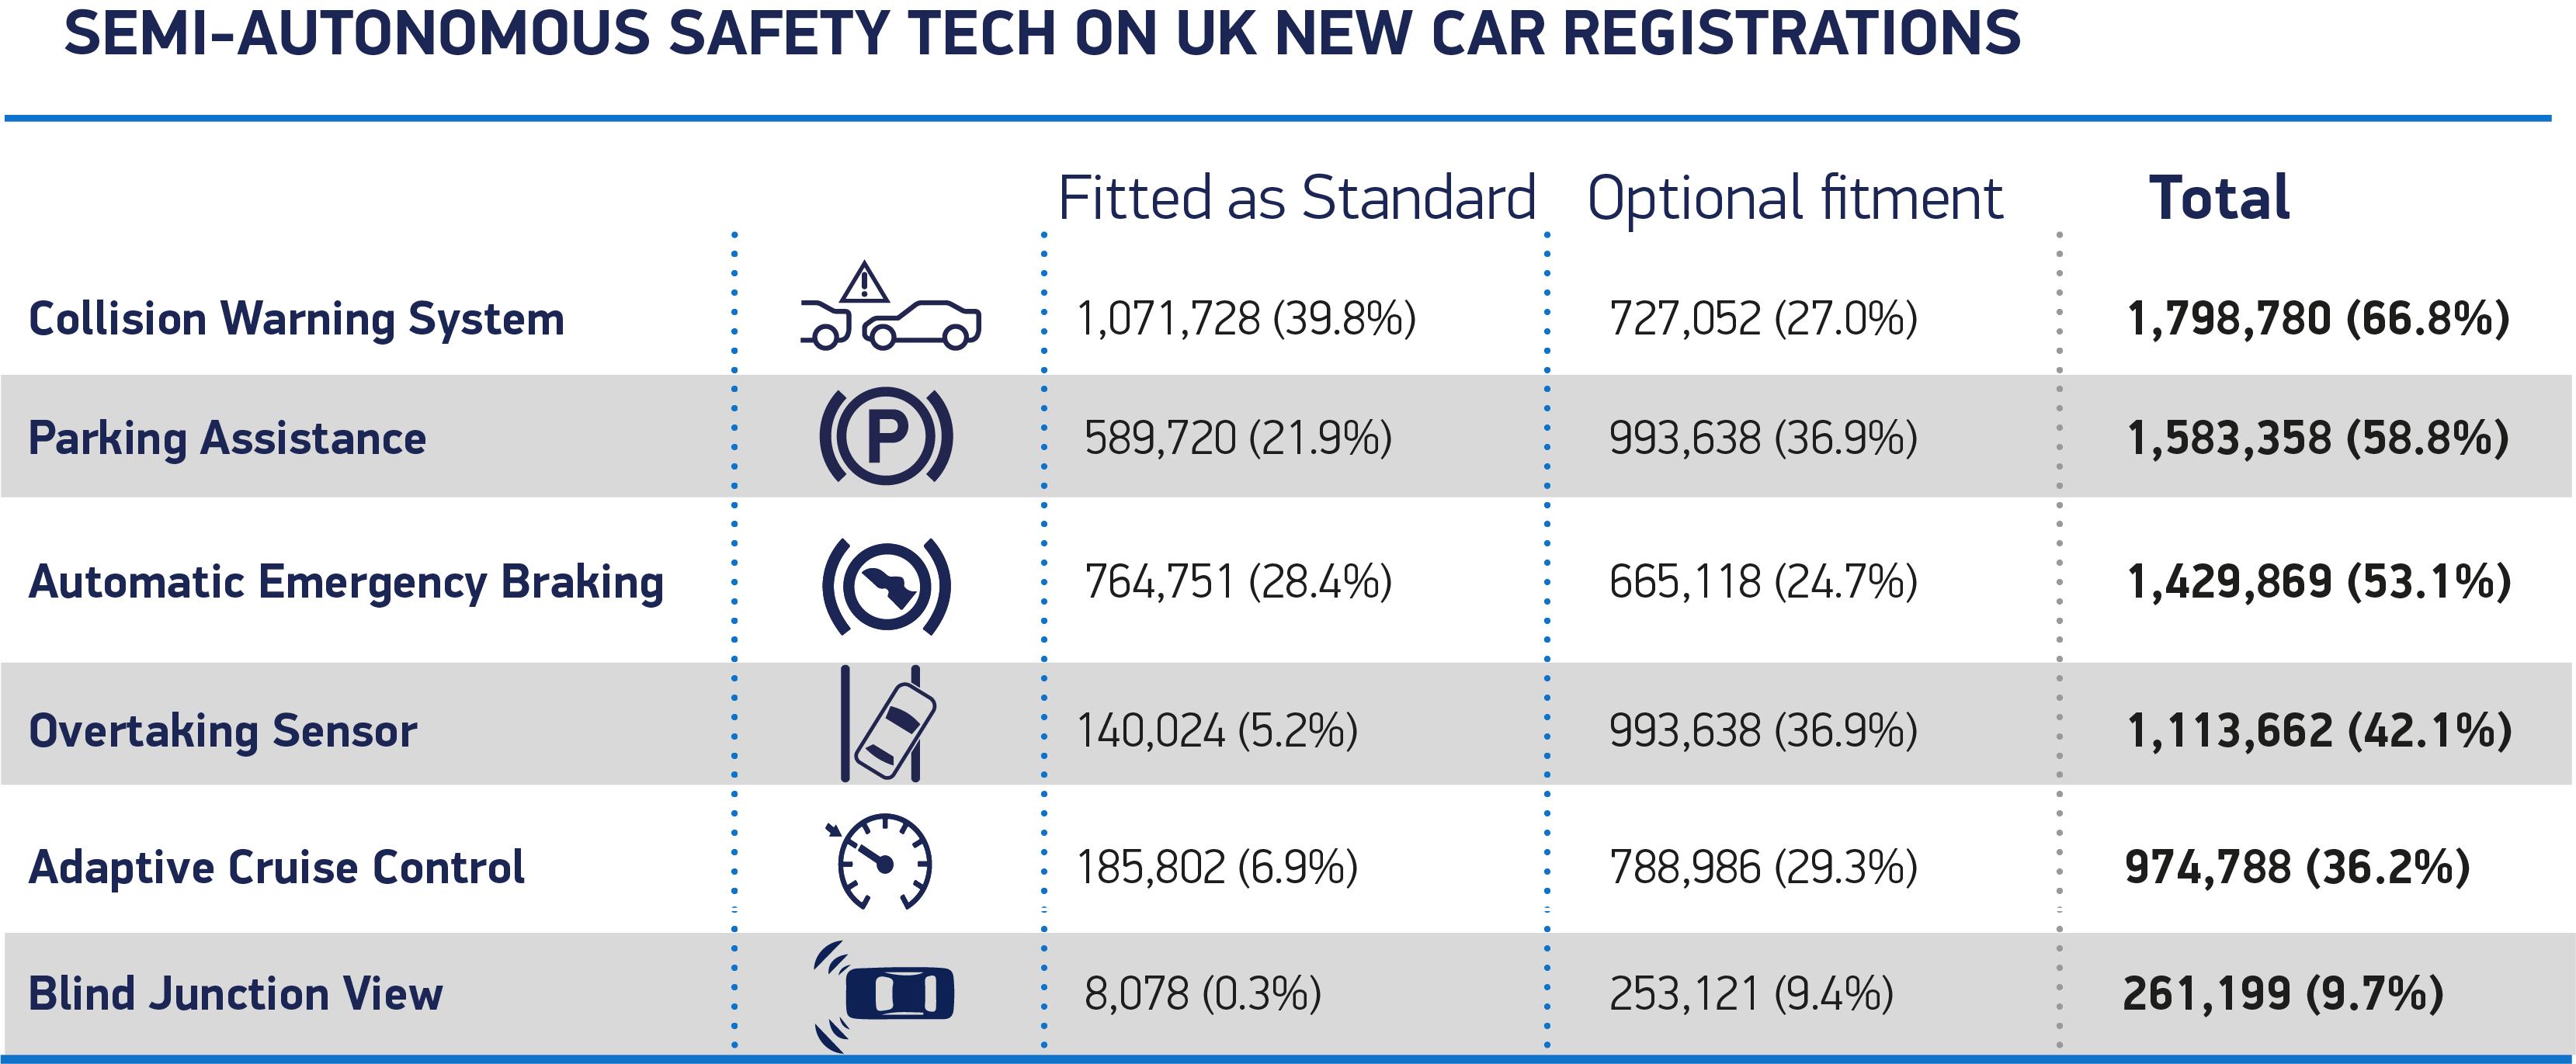 Semi-Autonomous Safety Tech on UK new car registrations